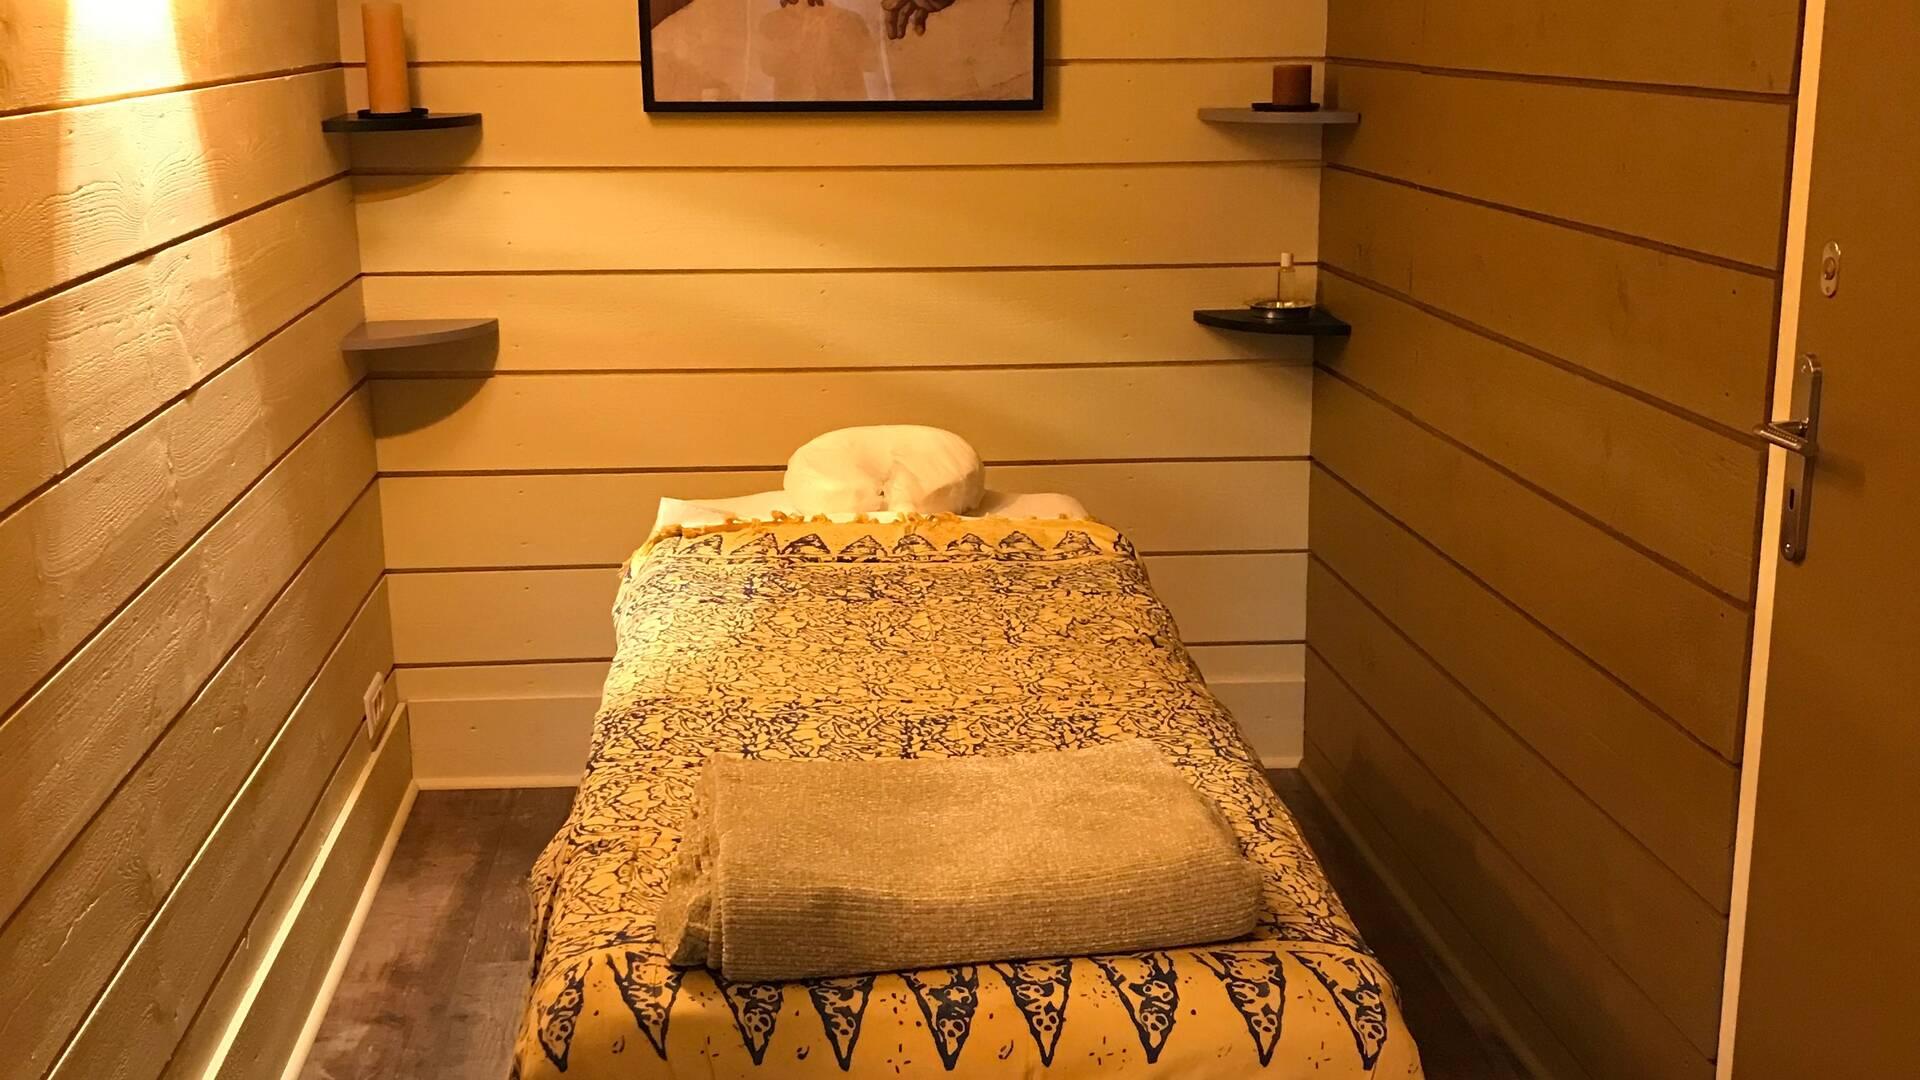 Massage room, Gite La Maison Bleue, Savignac-Mona, Lombez, Samatan, Savès, Gascogne, Gers, France